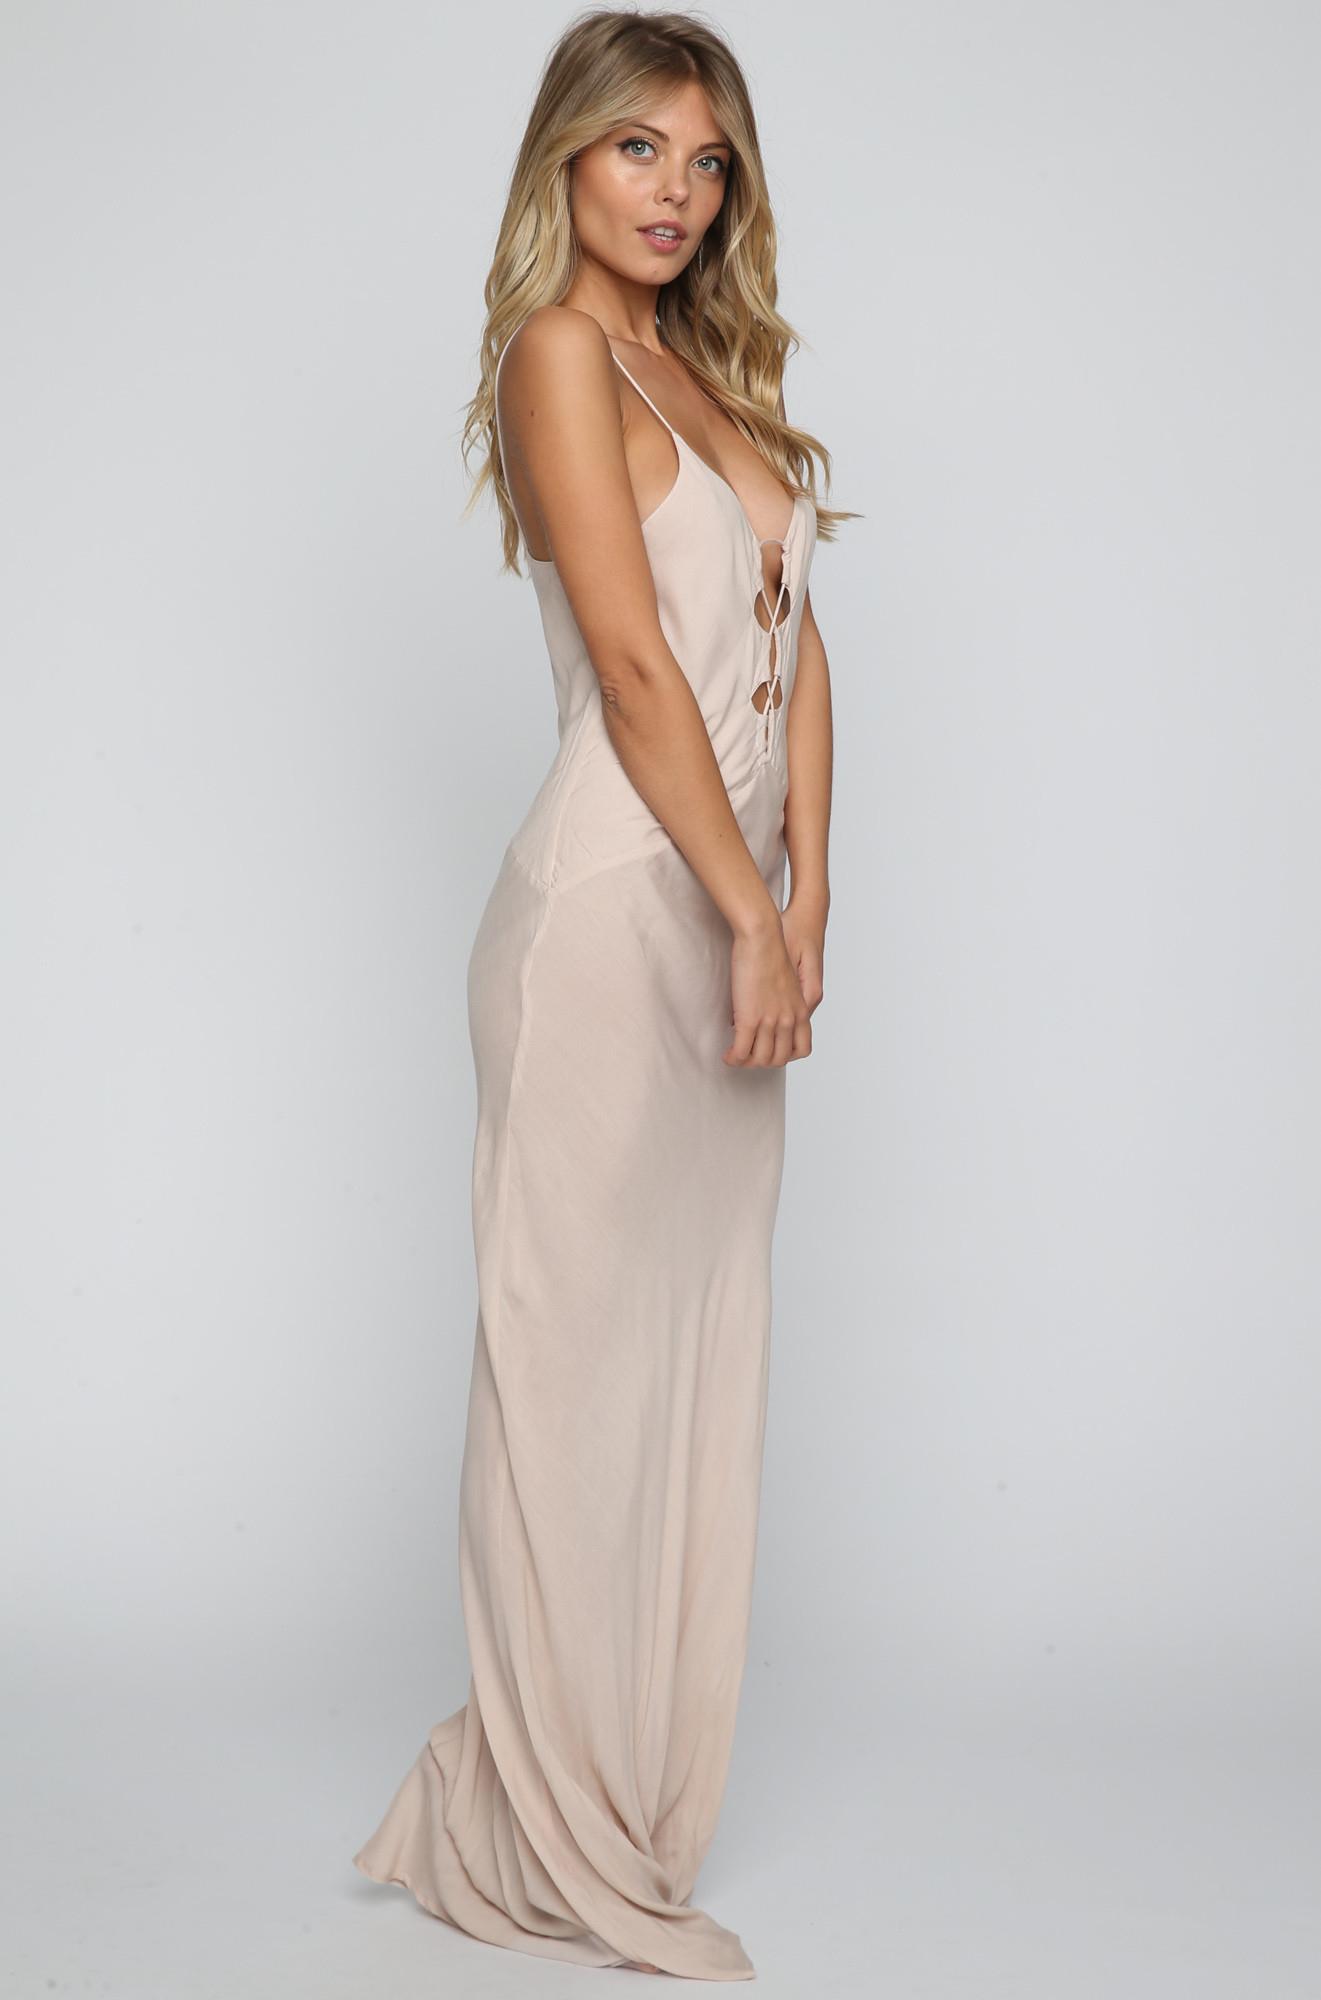 Brawa maxi dress acacia